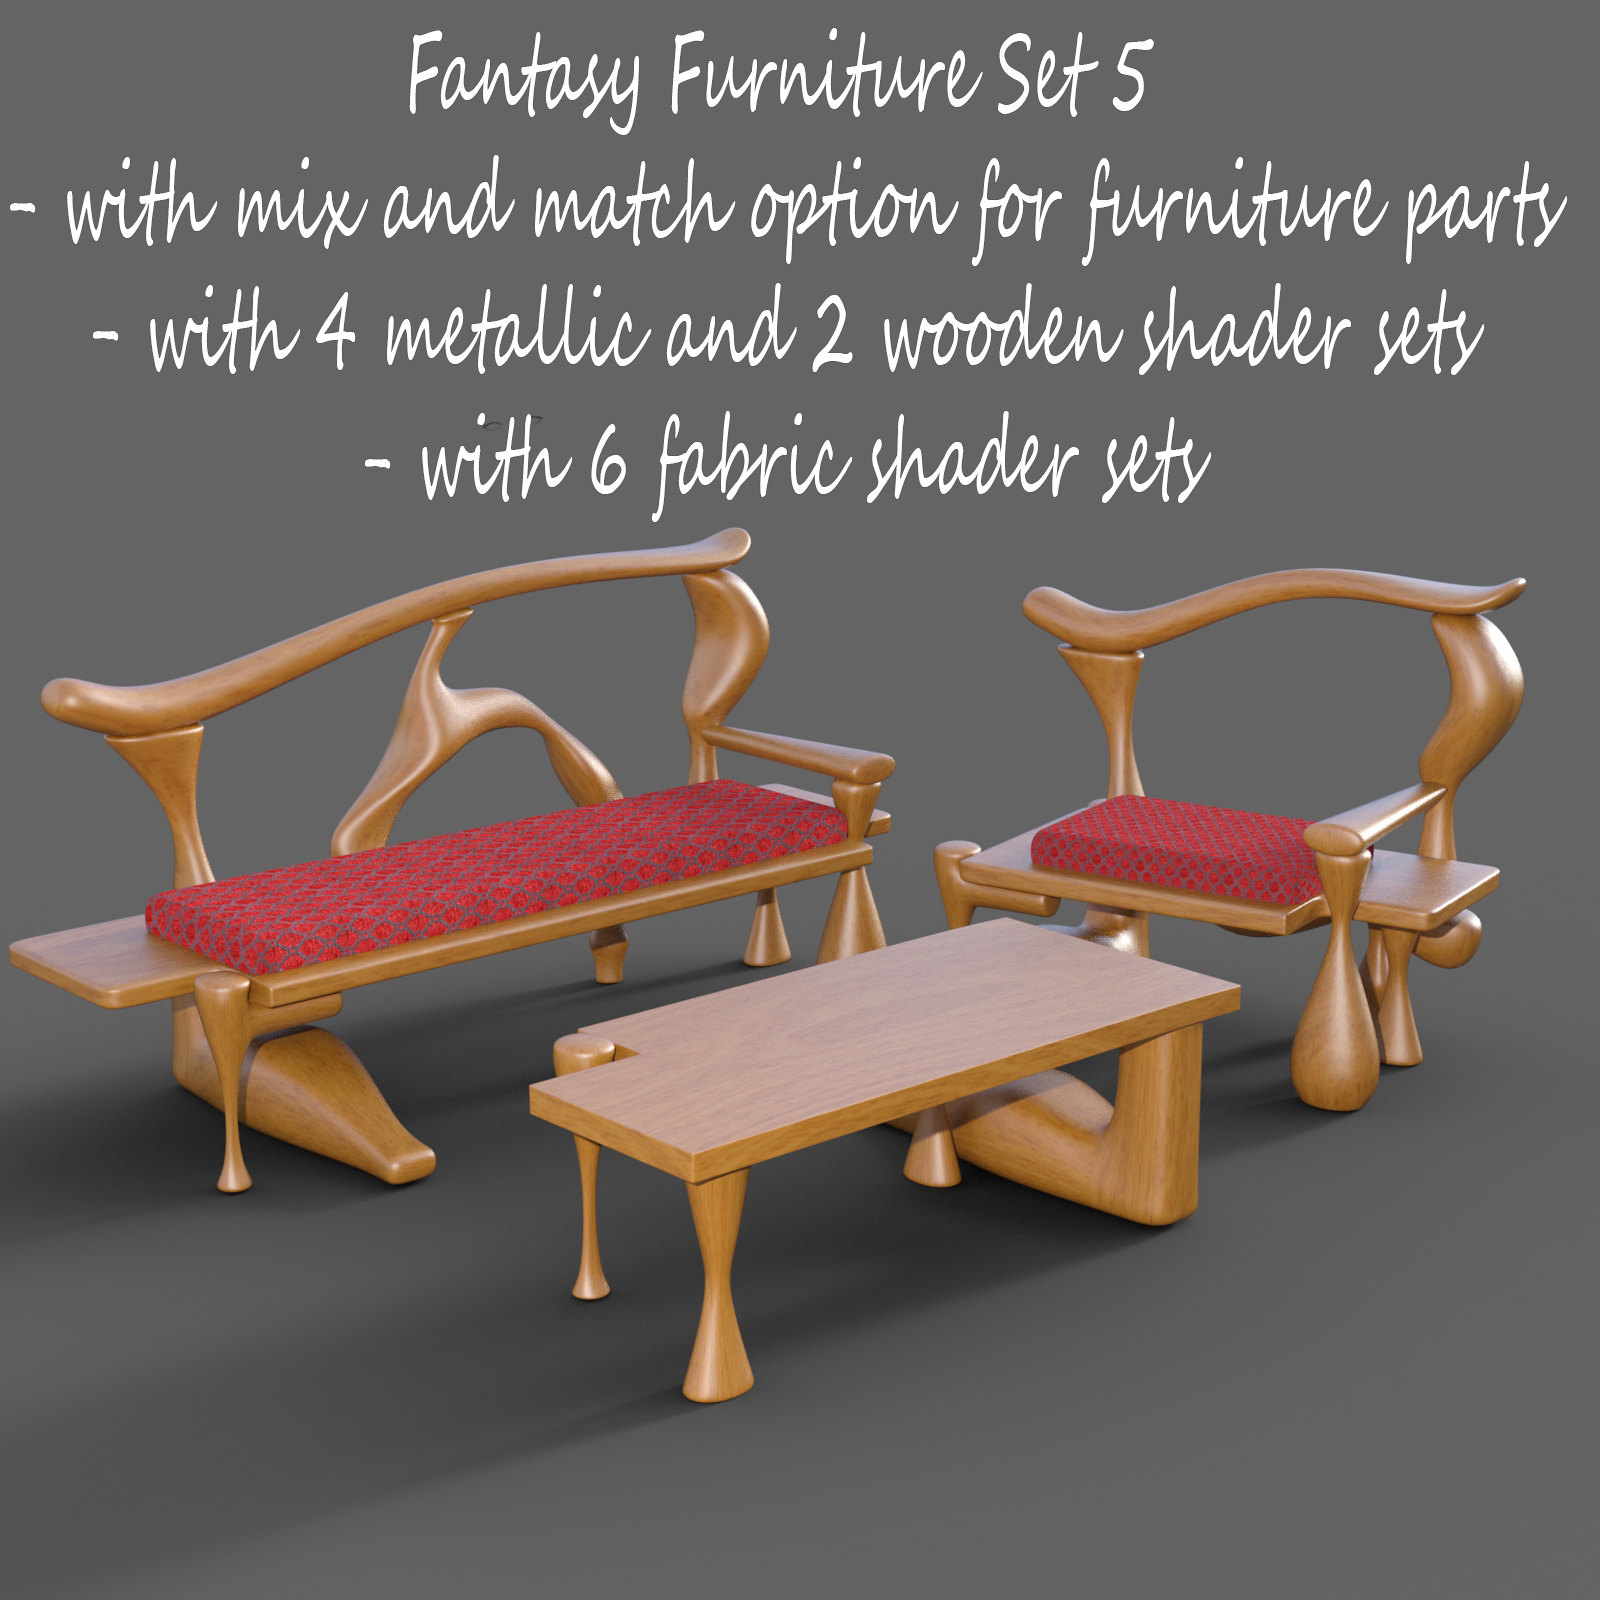 Fantasy Furniture Set 5